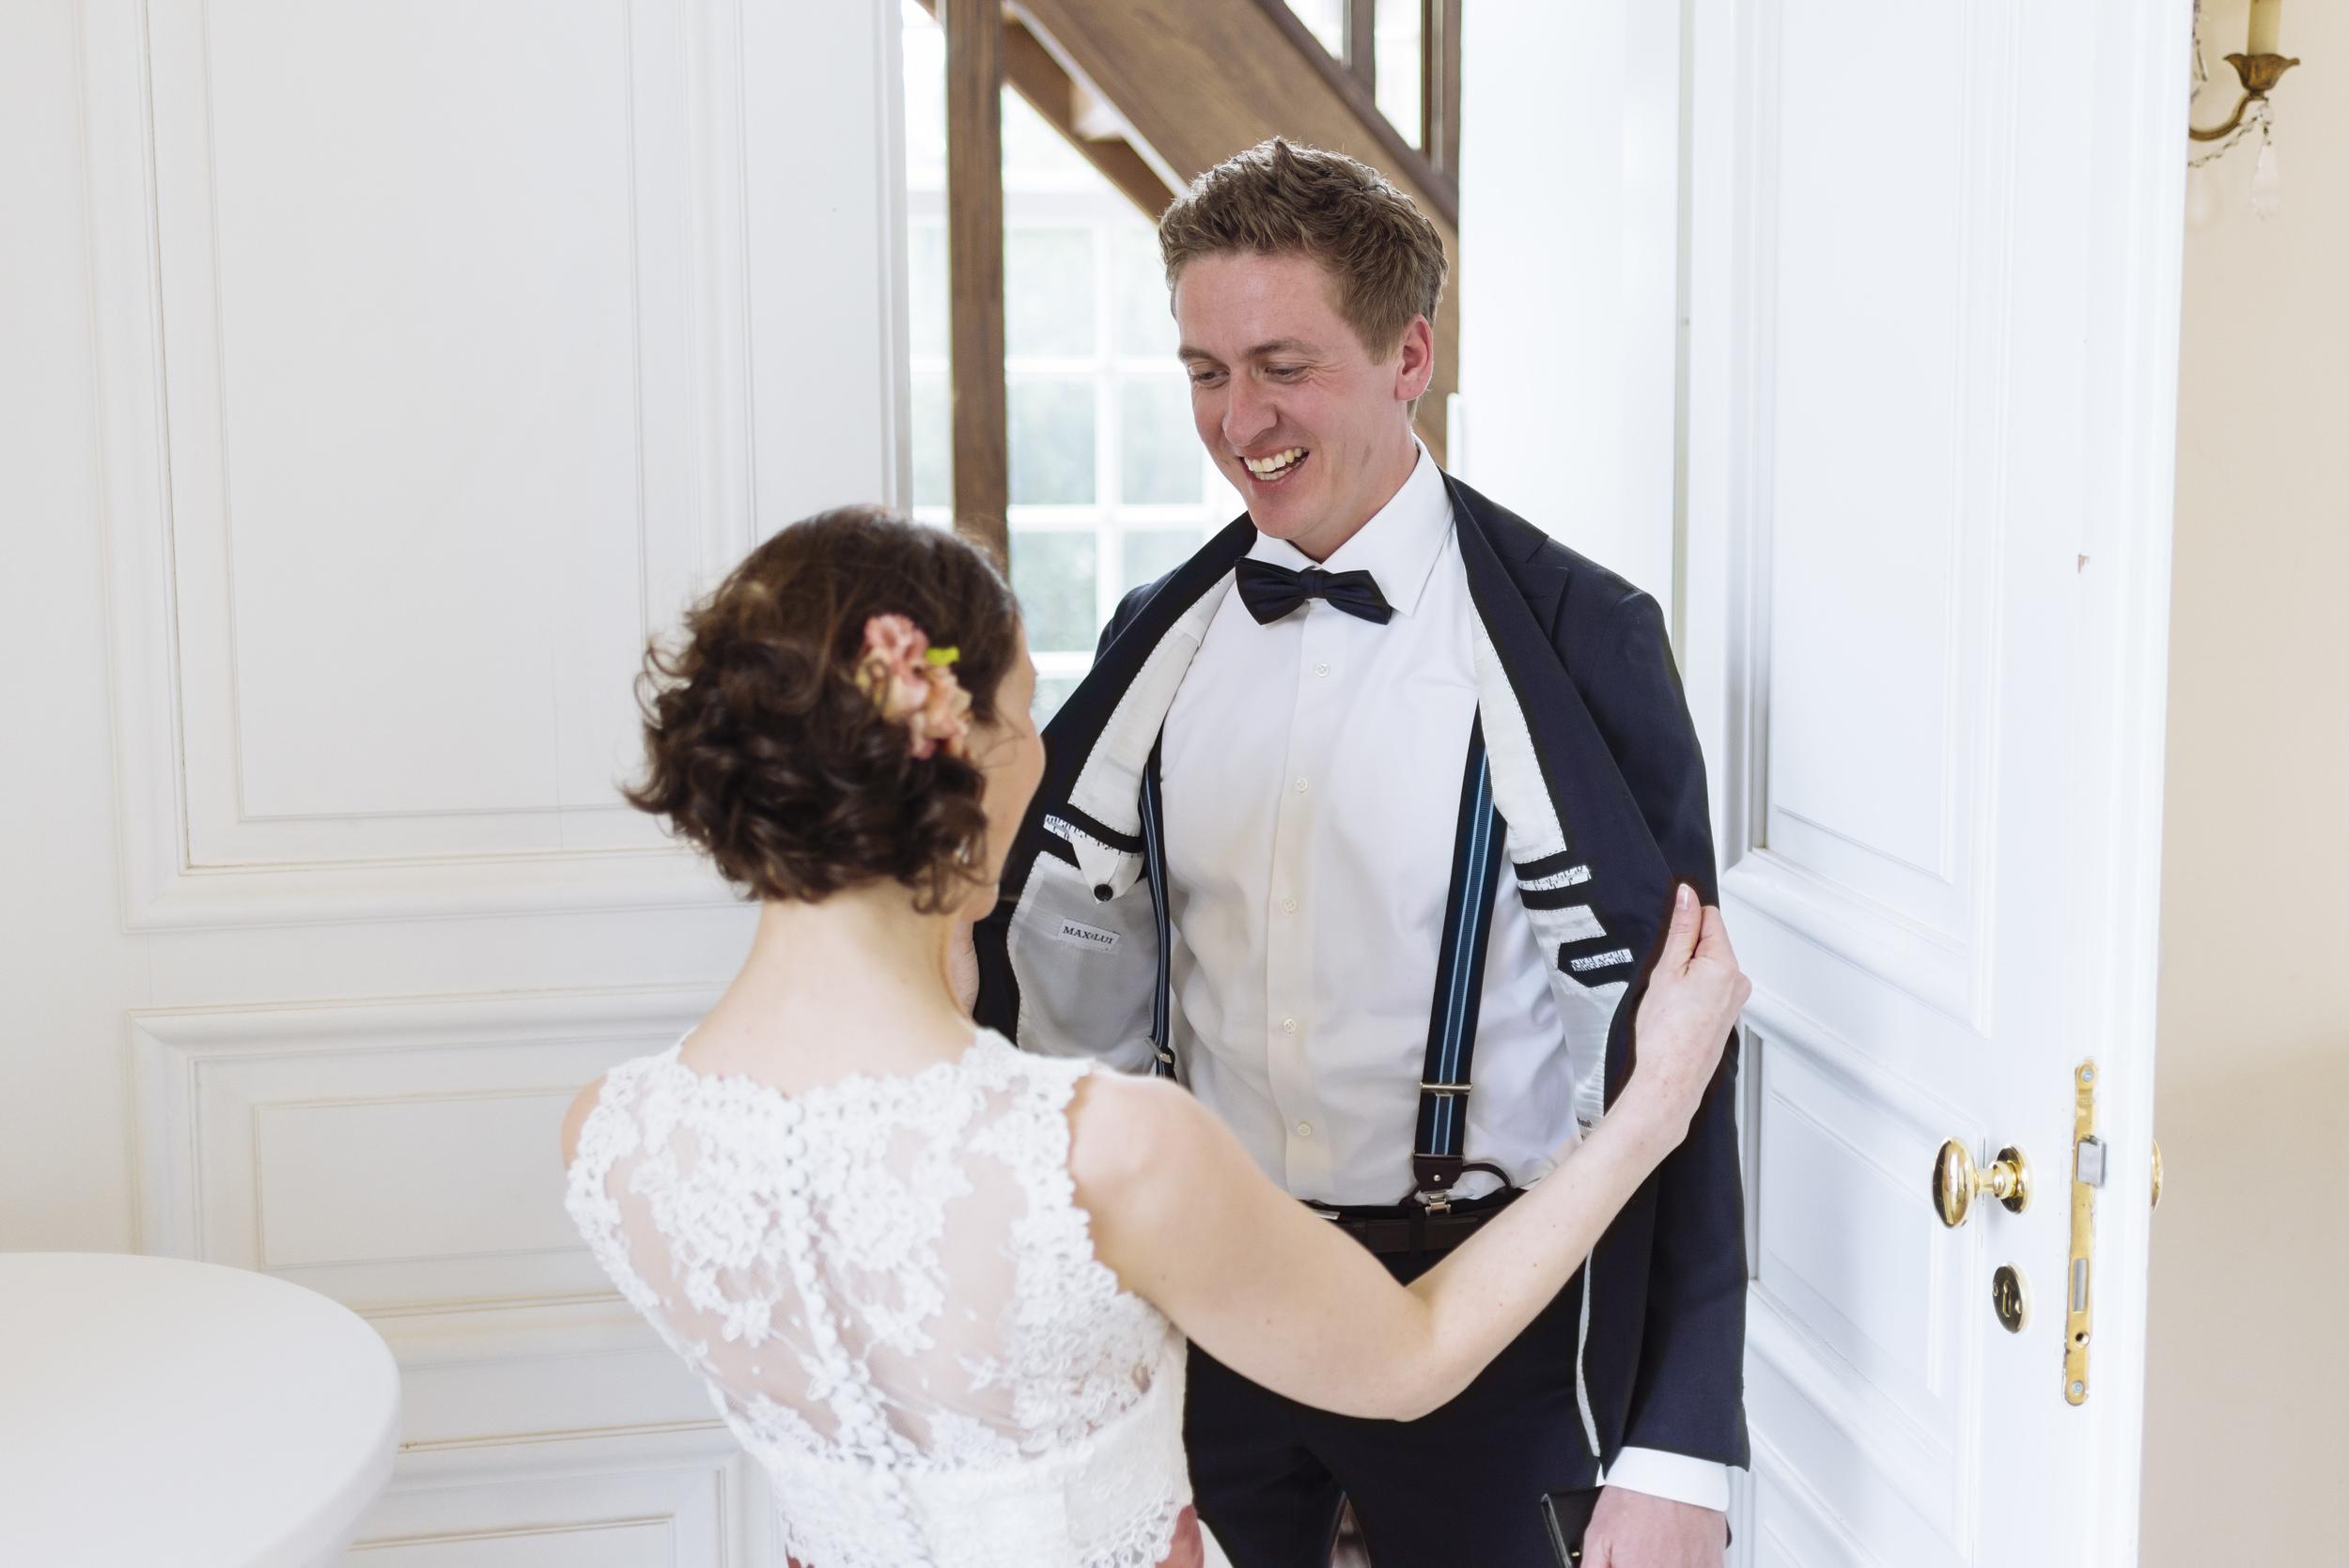 Hochzeitsfotograf-Schlossruine-Hertefeld-Weeze-010.jpg